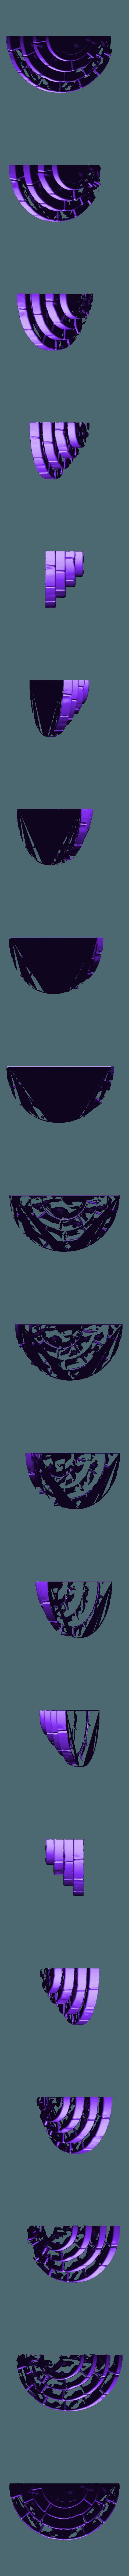 stairs_round.stl Download free STL file Fantasy city set • 3D printable model, HeribertoValle